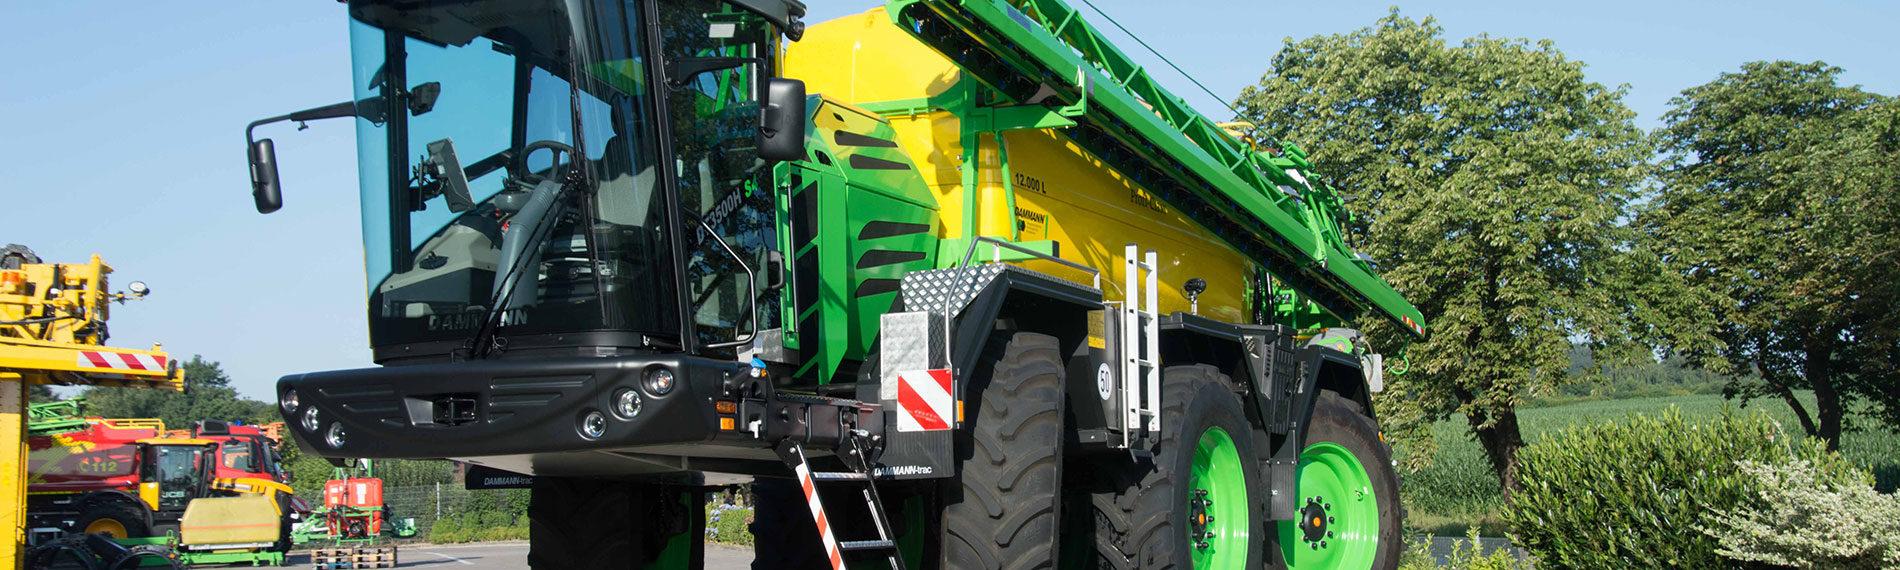 dammann pflanzenschutztechnik trac dt3500h selbstfahrer parallax